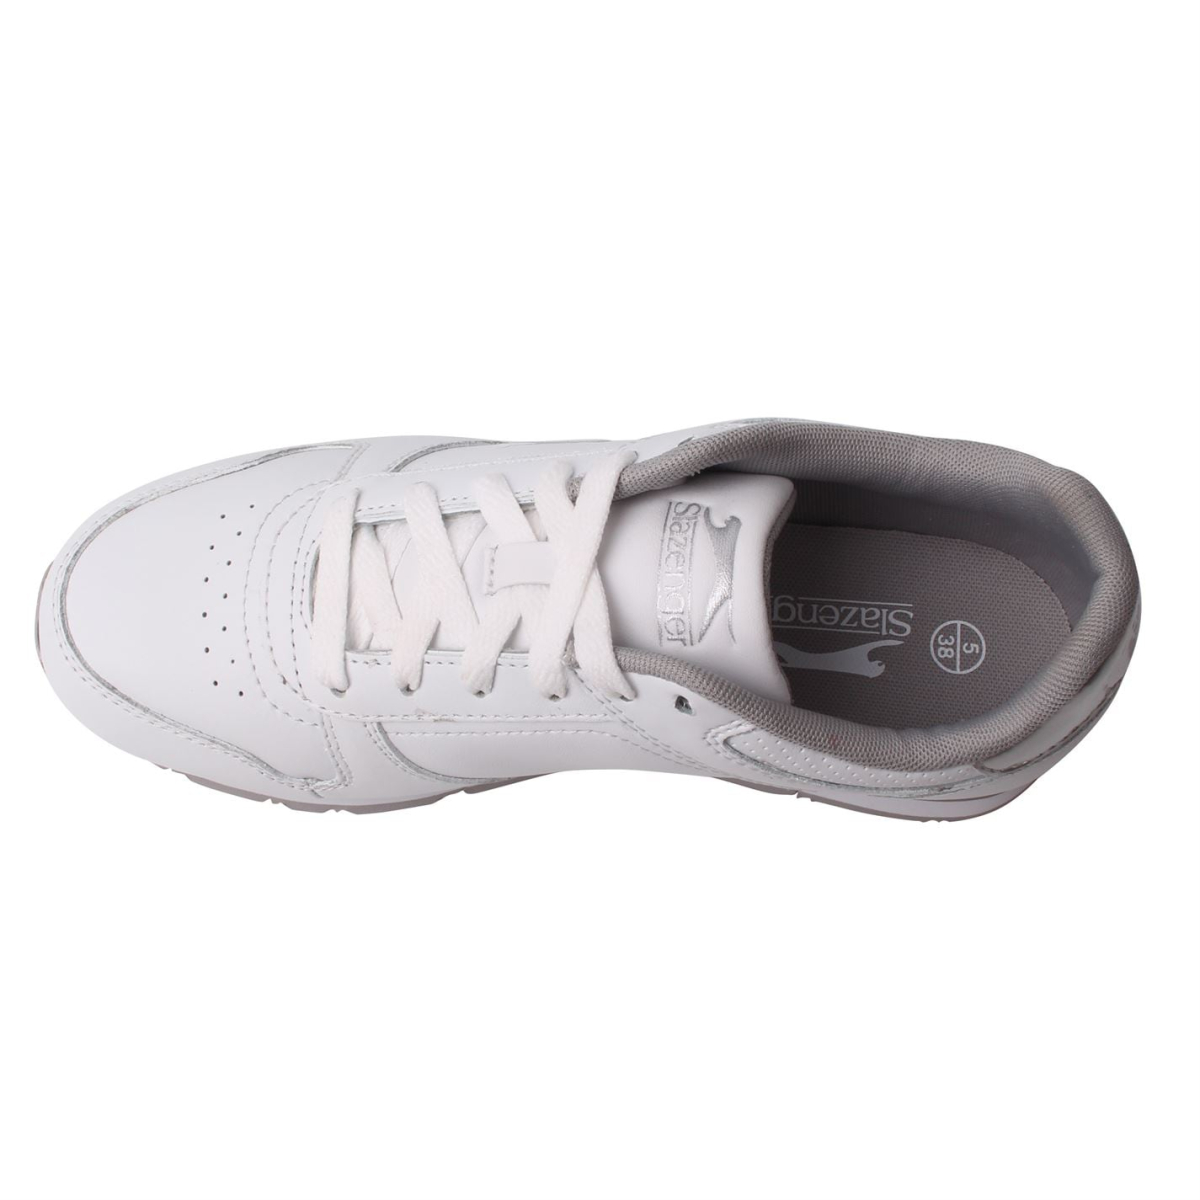 Slazenger-Classic-Turnschuhe-Laufschuhe-Damen-Sportschuhe-Sneaker-1265 Indexbild 25